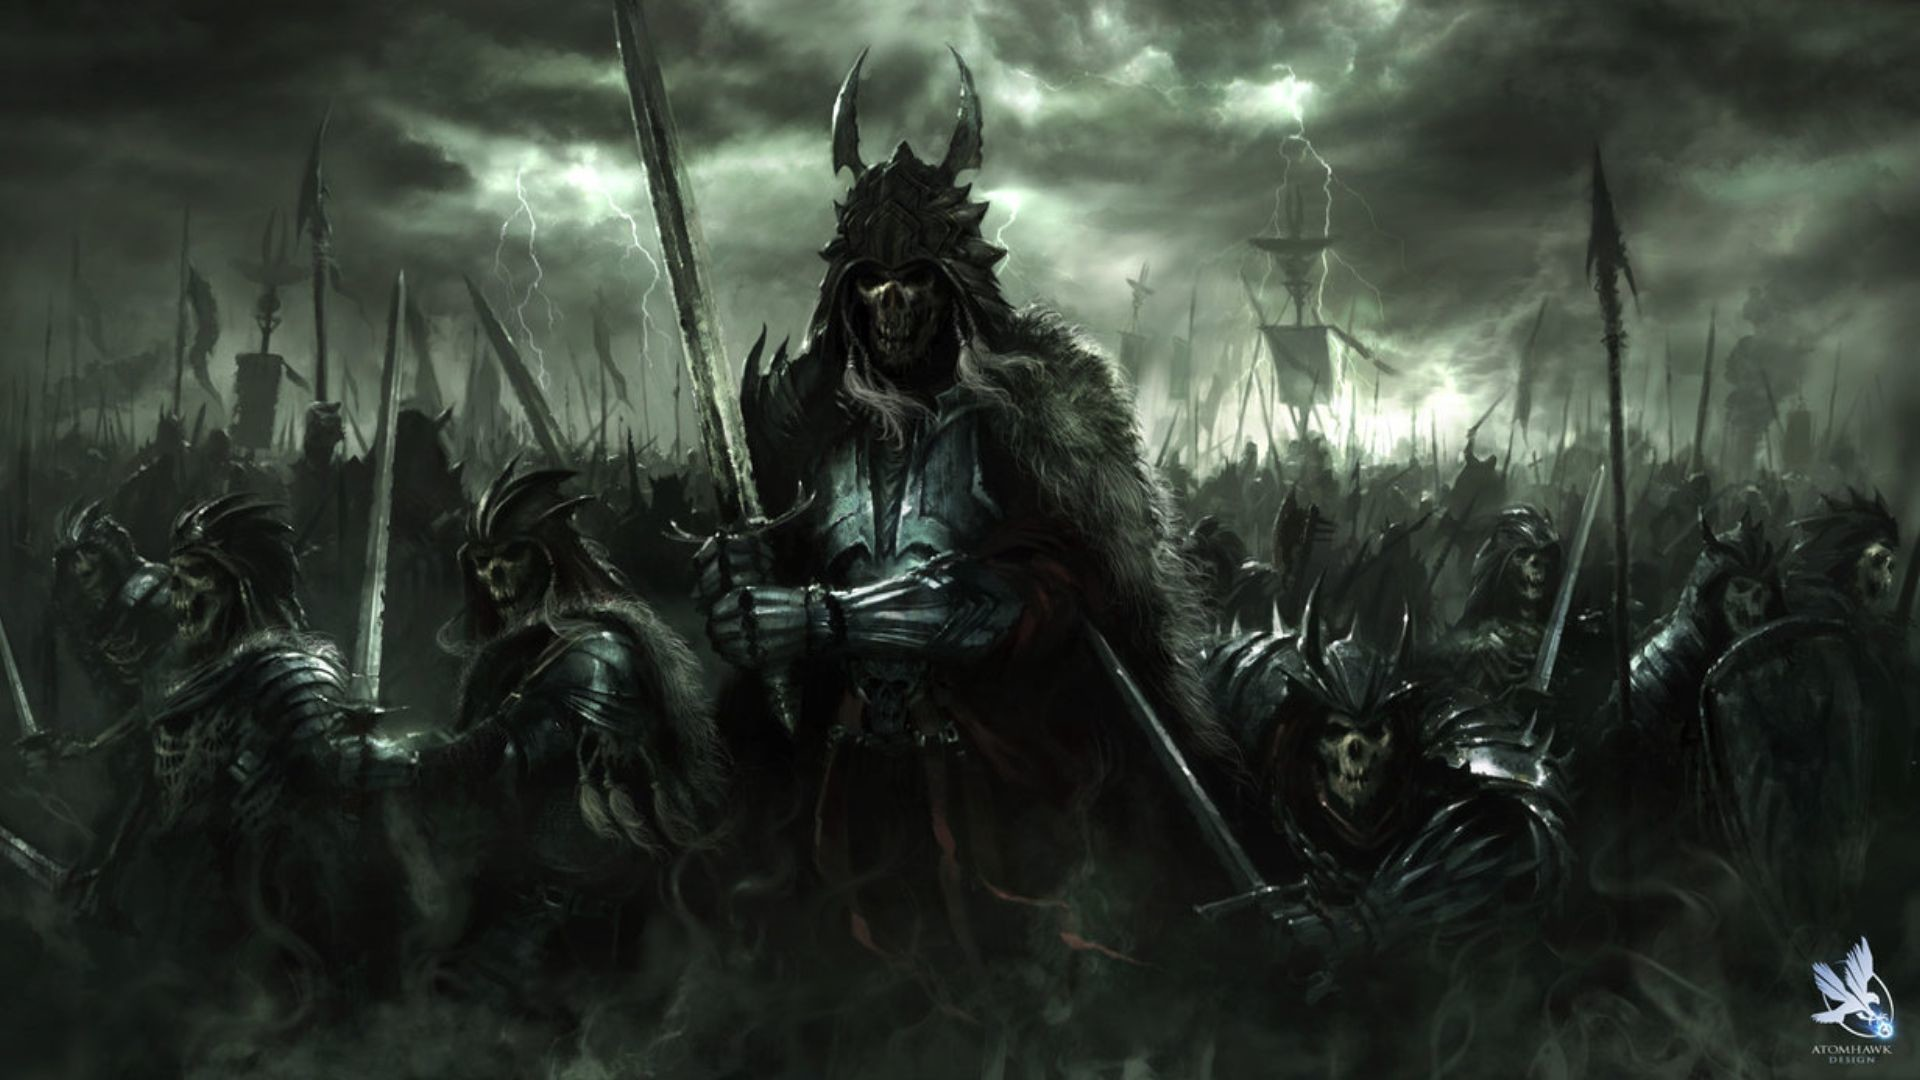 Demon king wallpapers 77 images - Demon wallpaper 4k ...